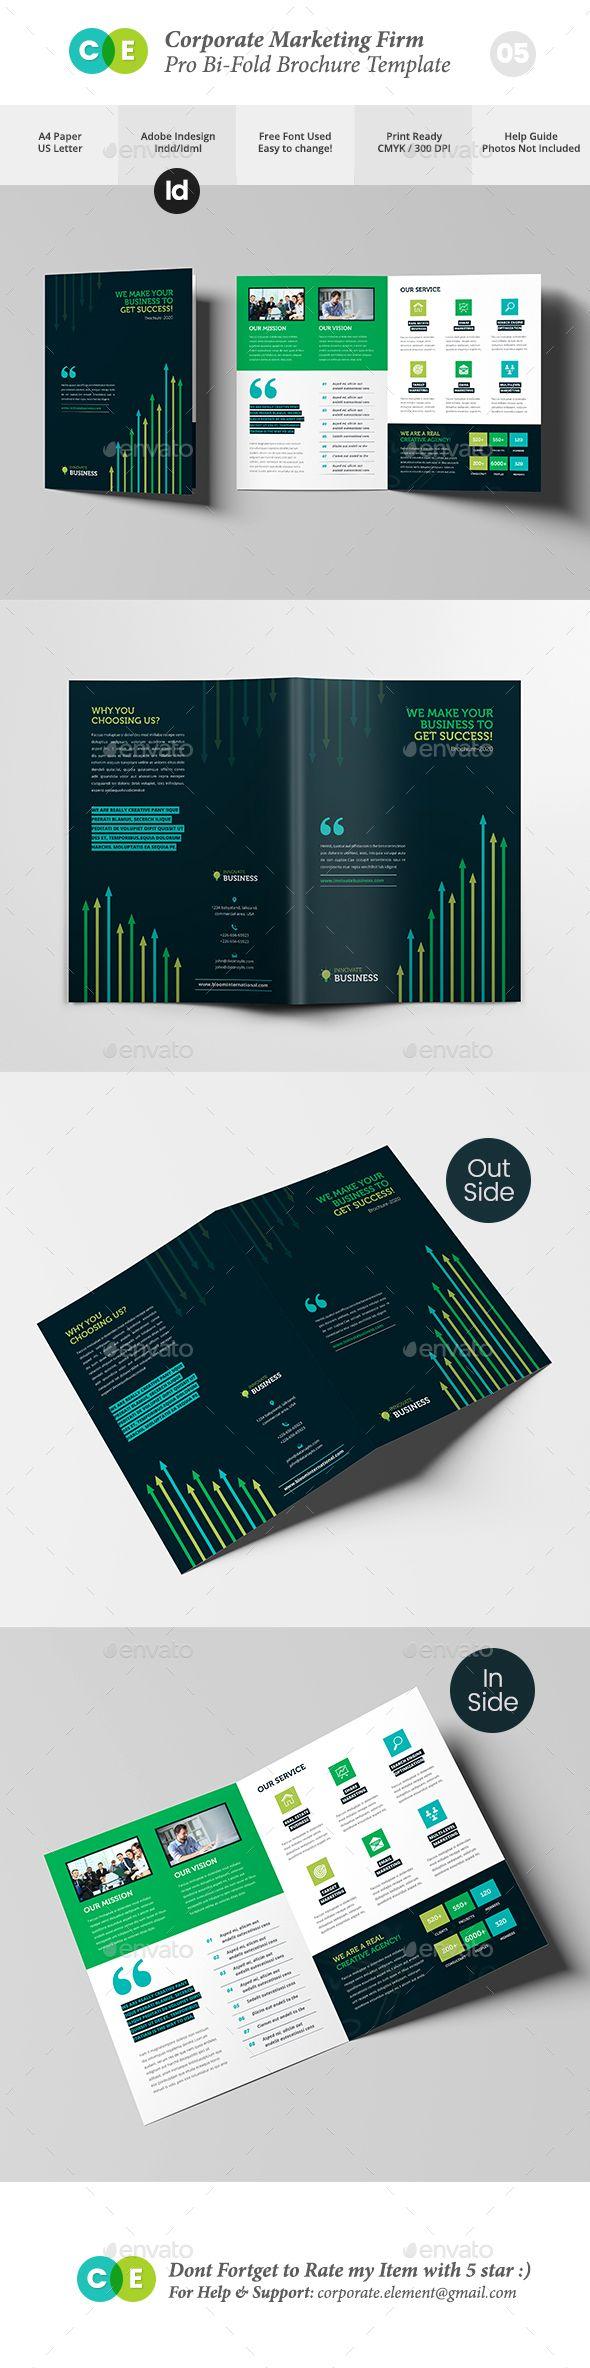 Marketing Firm Pro Bi-Fold Brochure V05